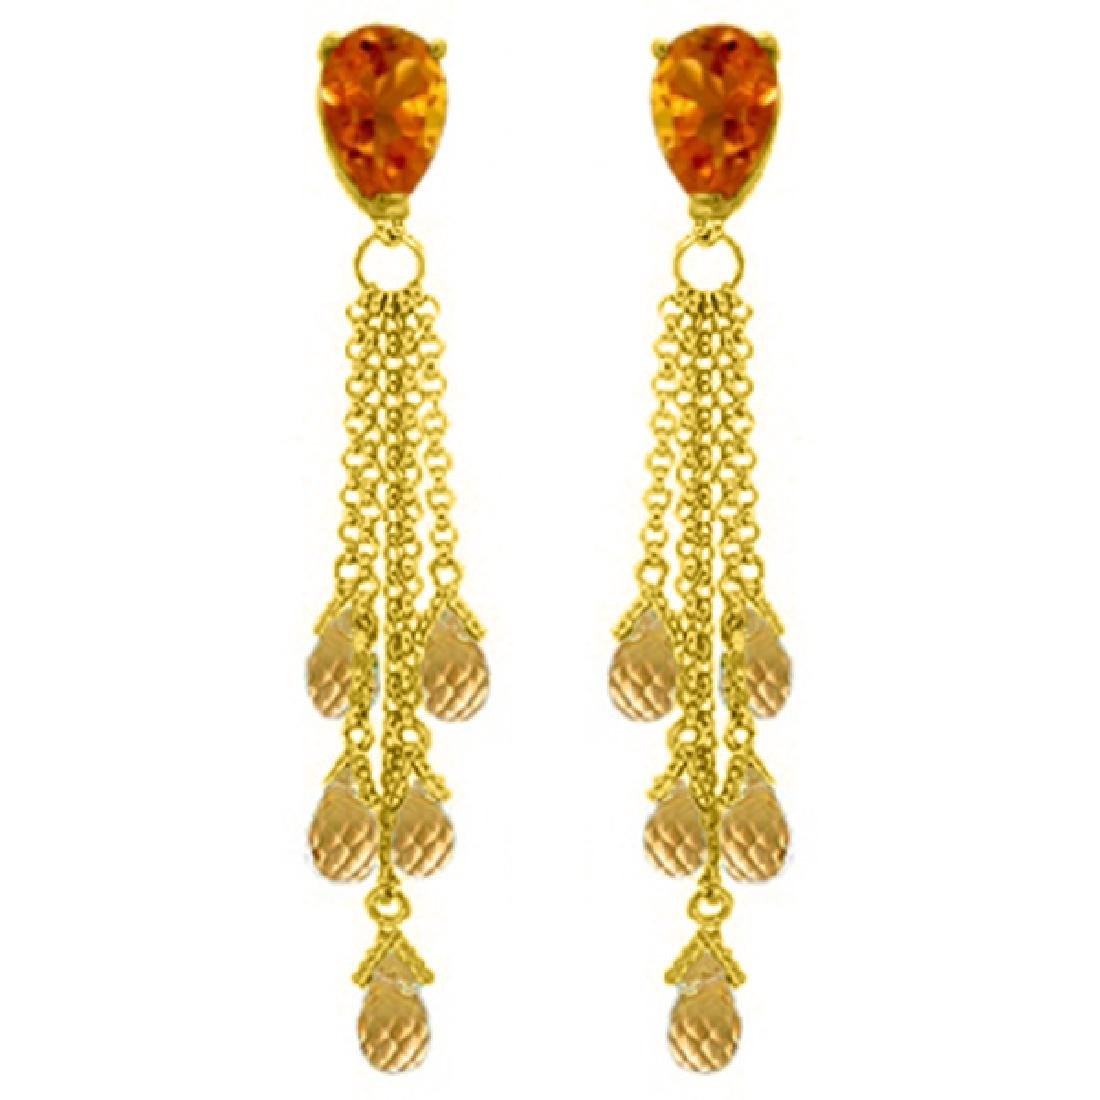 Genuine 15.5 ctw Citrine Earrings Jewelry 14KT Yellow